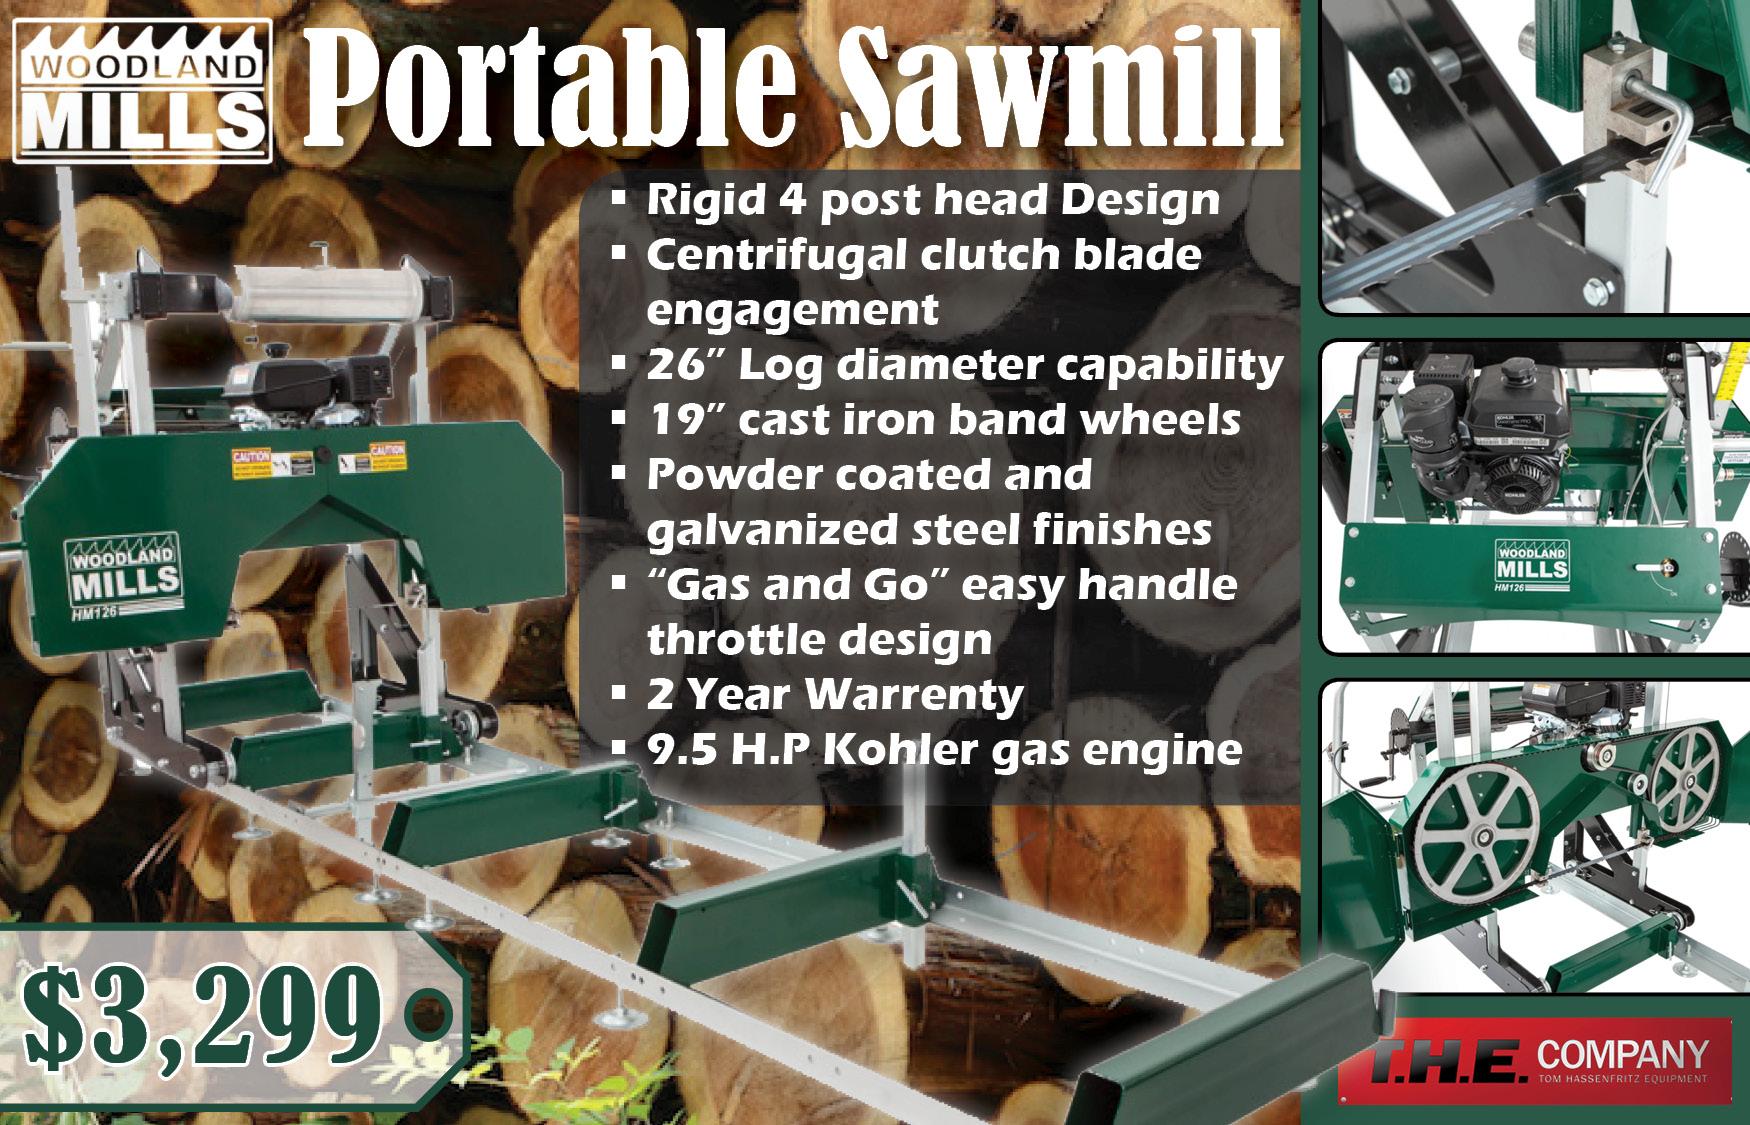 Woodland Mills Portable Sawmill - T H E  Company